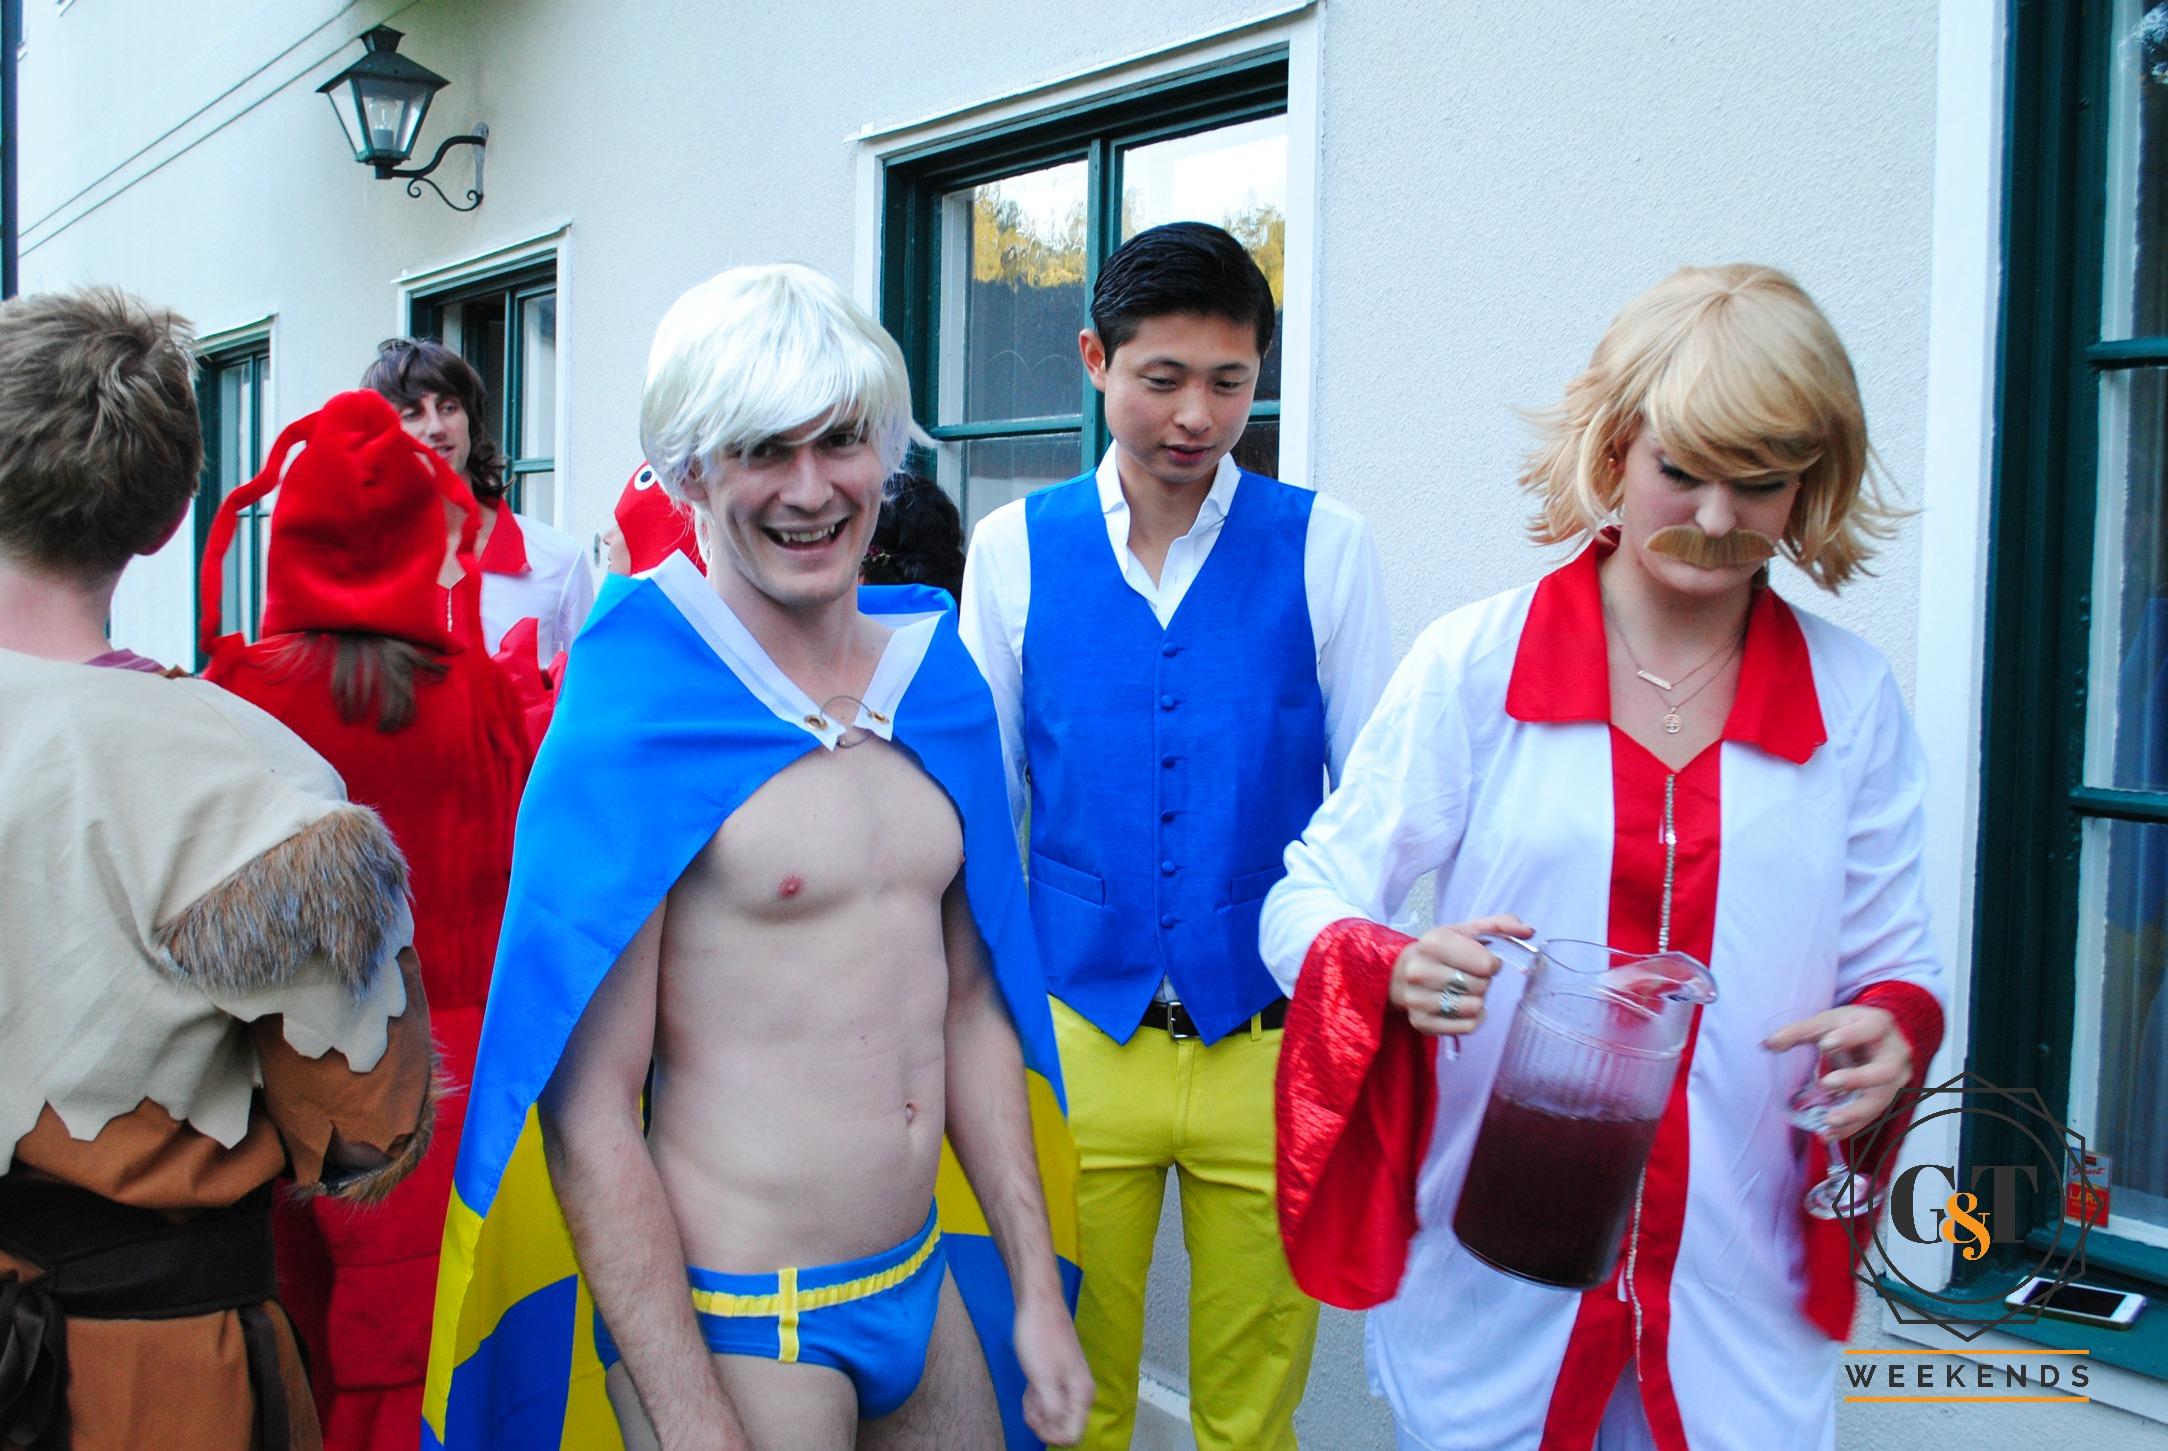 Swedish costume party